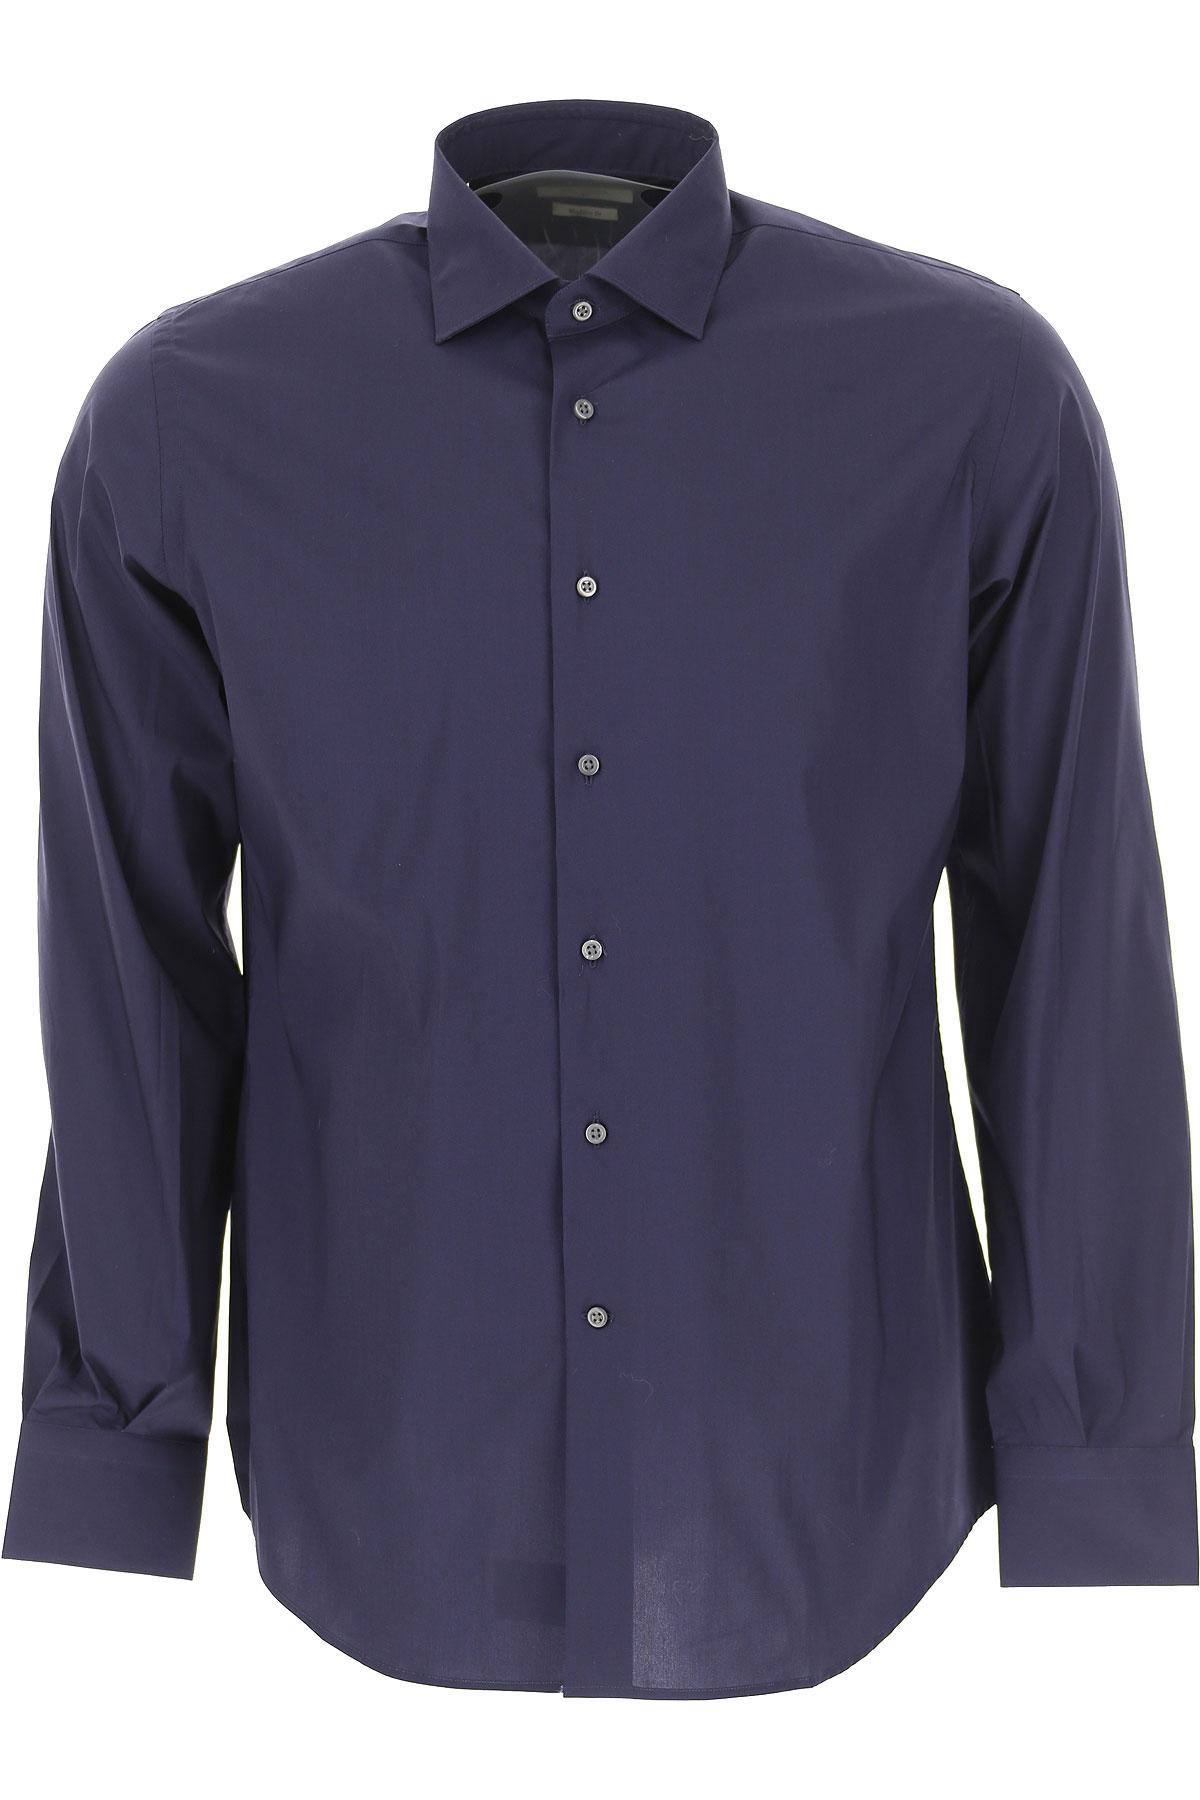 Del Siena Shirt for Men On Sale, Midnight Blue, Cotton, 2019, 15.5 15.75 17 17.5